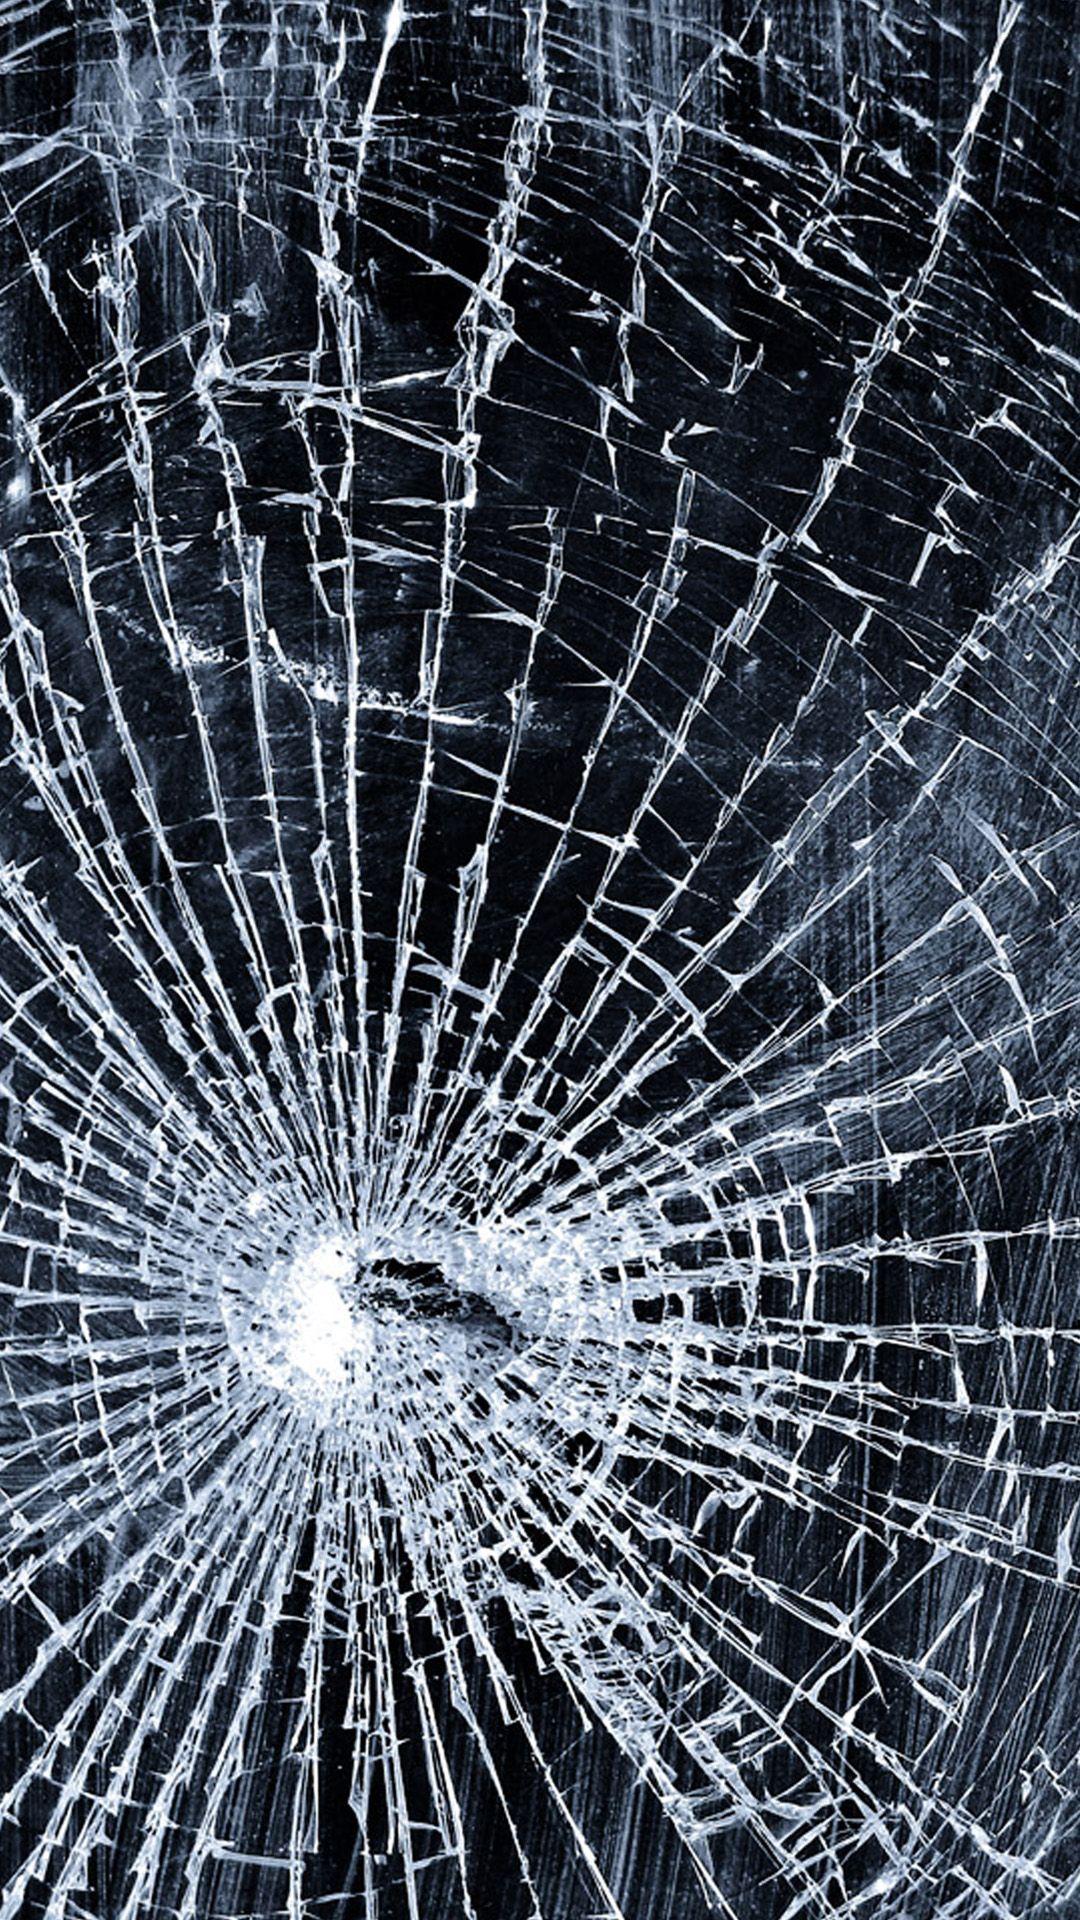 Cracked Screen Wallpaper HD | Wallpapers in 2019 | Phone screen wallpaper, Cracked phone screen ...